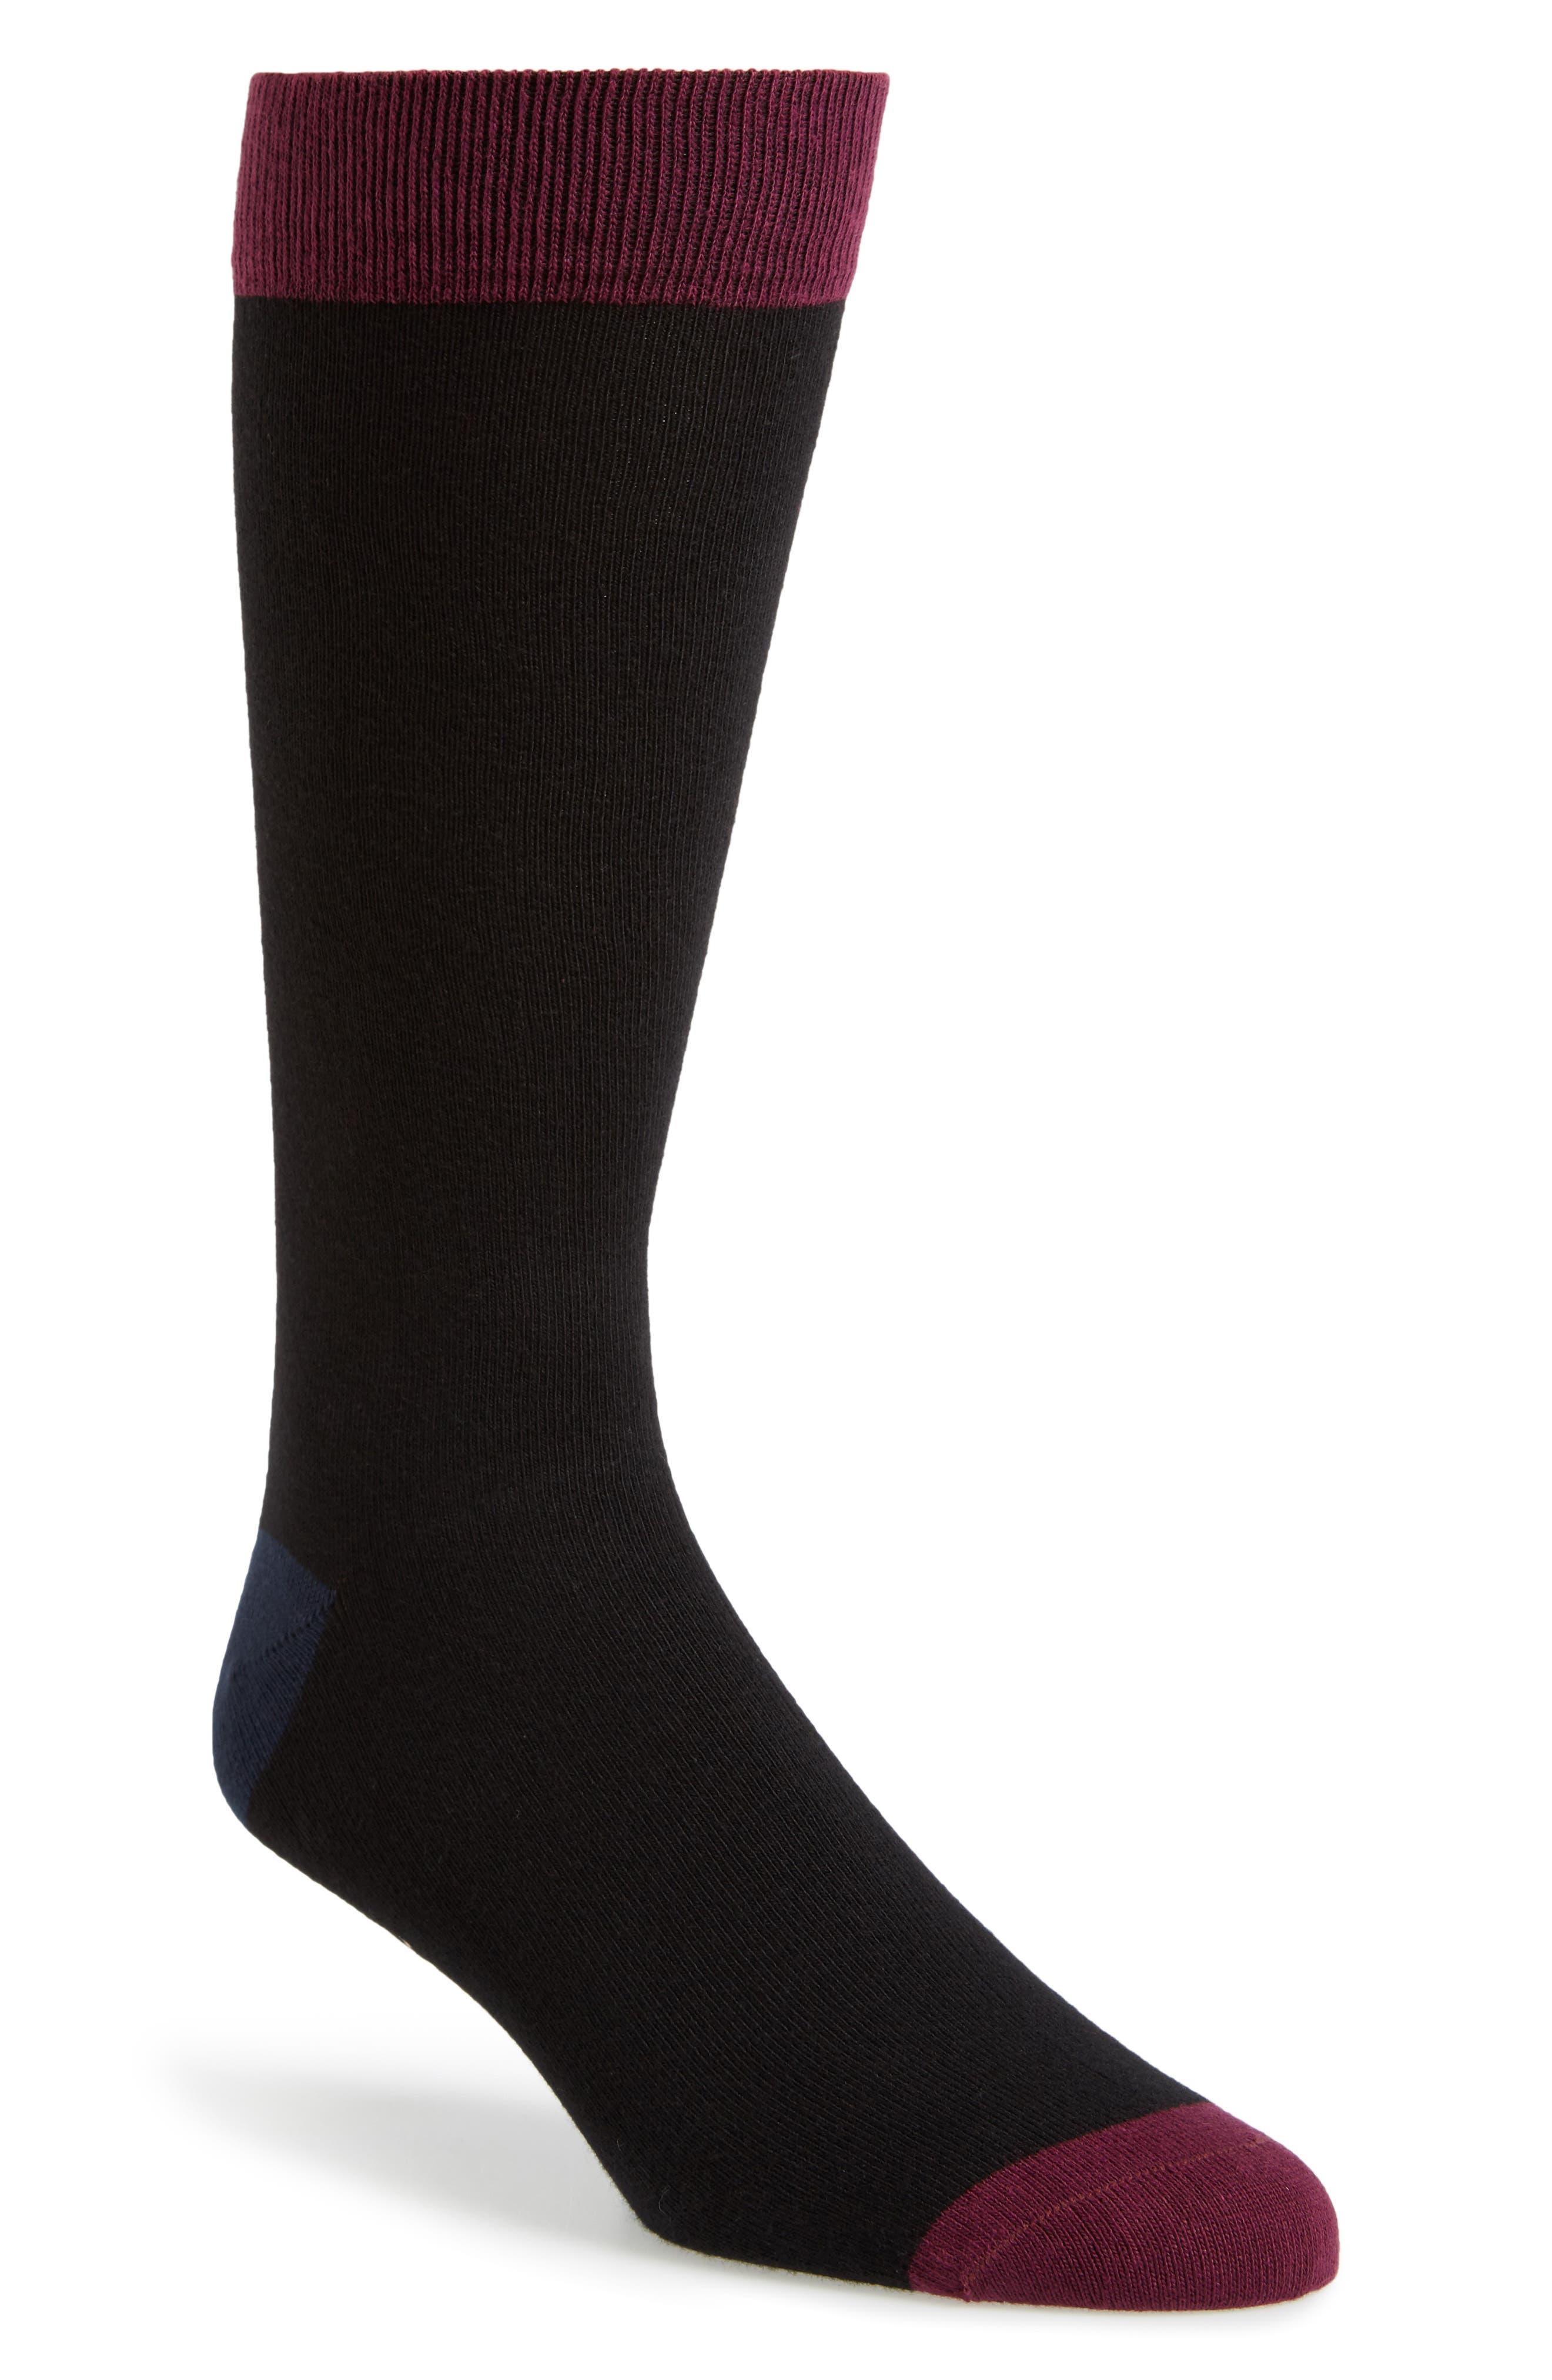 Alternate Image 1 Selected - Ted Baker London Gele Colorblock Socks